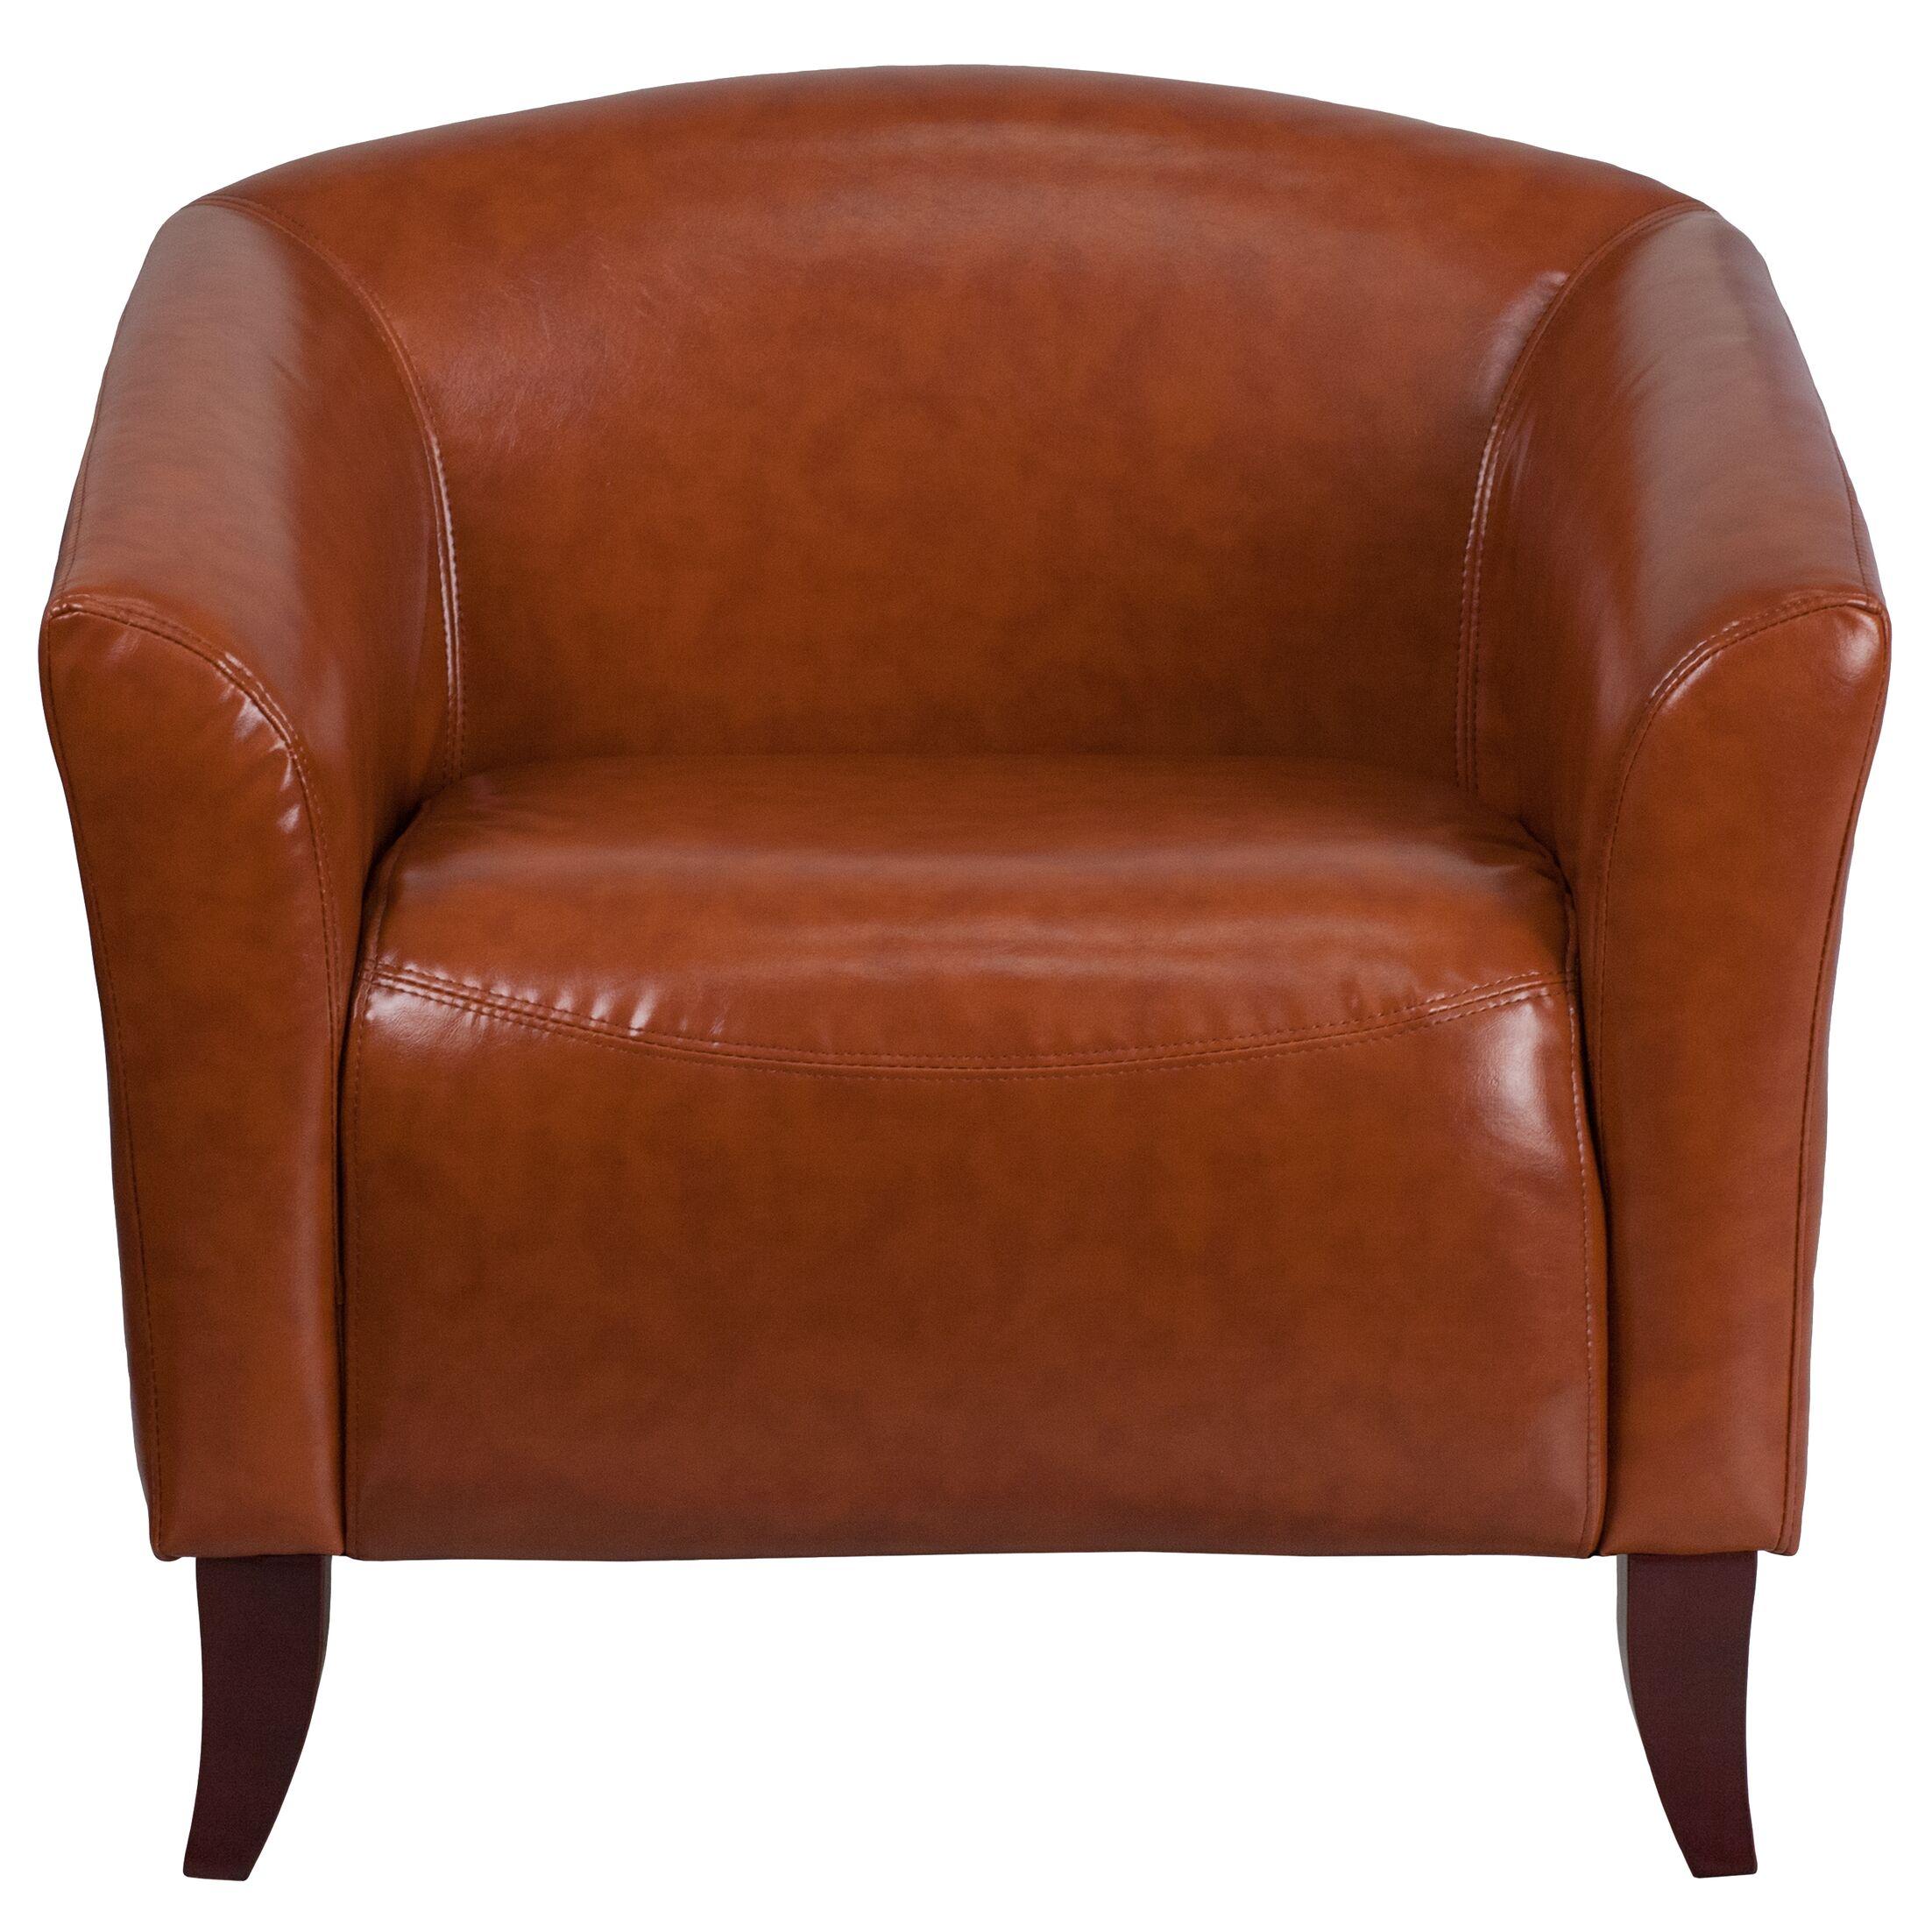 Pyron Leather Lounge Chair Seat Color: Cognac